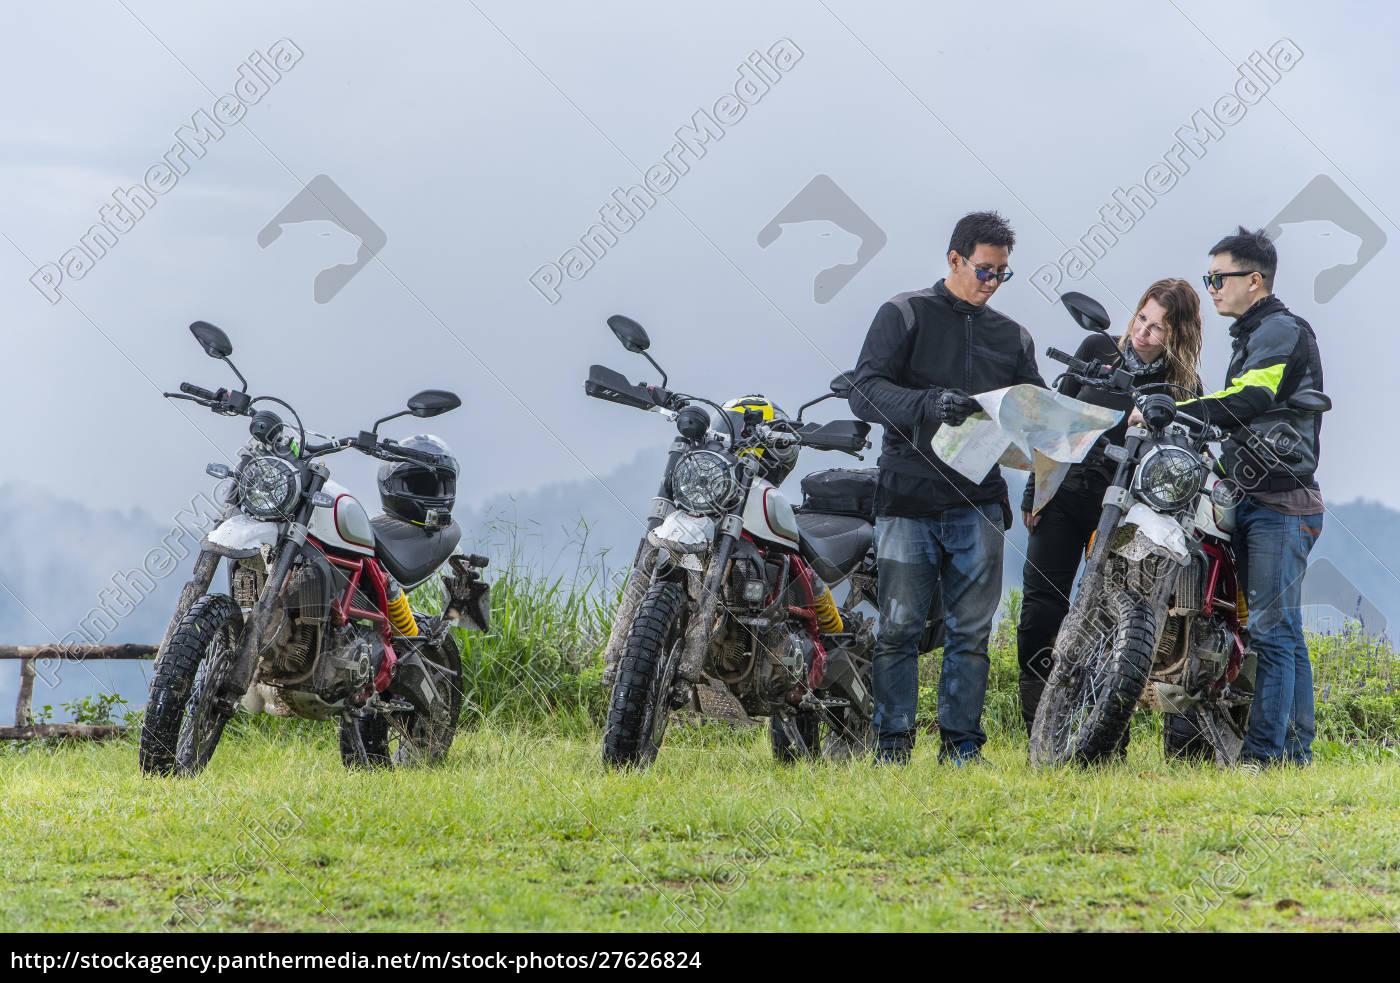 biker, überprüfen, karte, neben, off-road-motorrädern, berge, im - 27626824